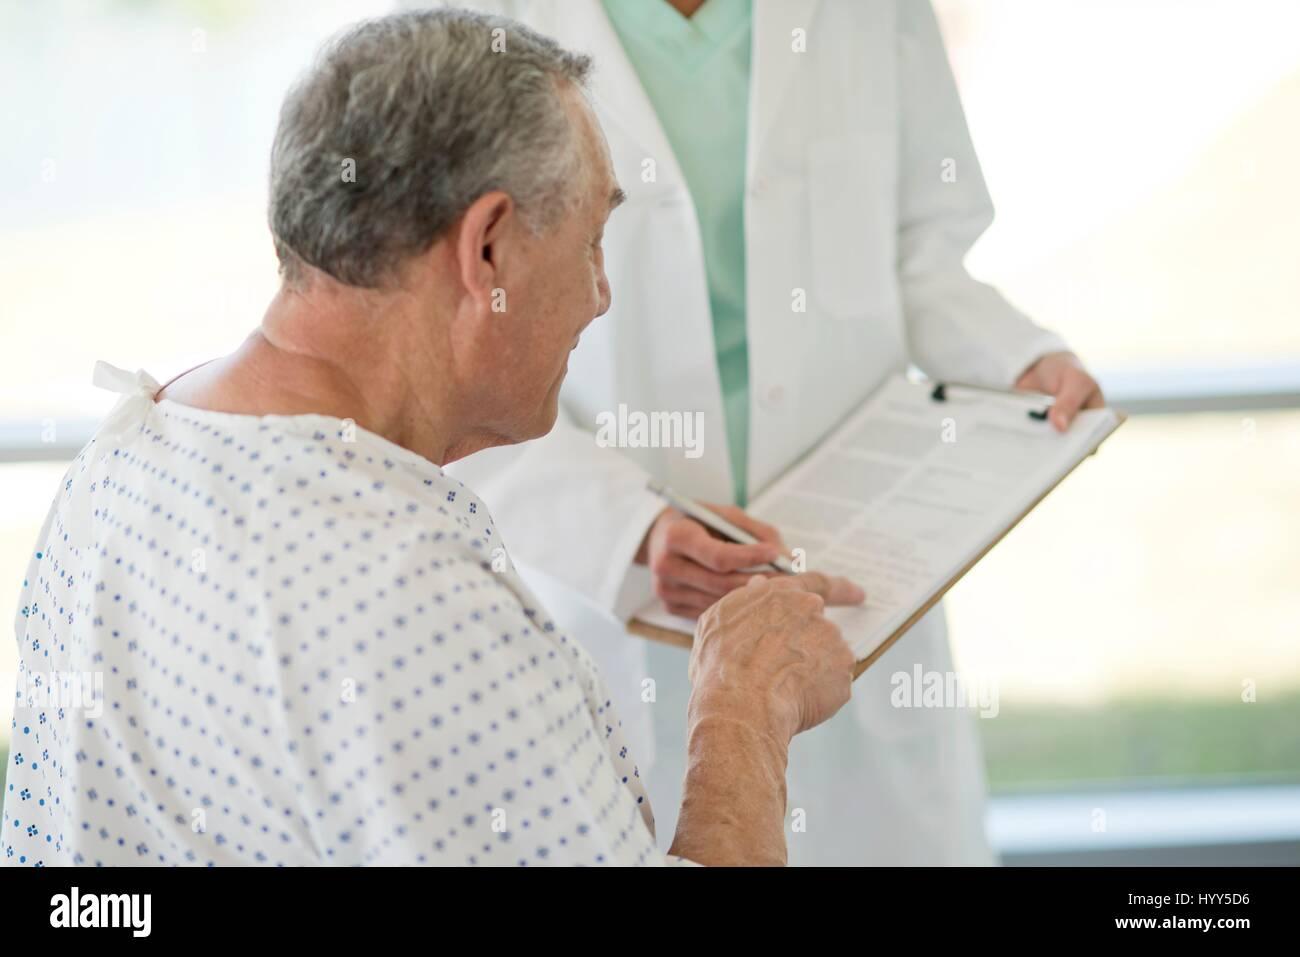 Senior man pointing at medical notes in hospital. - Stock Image